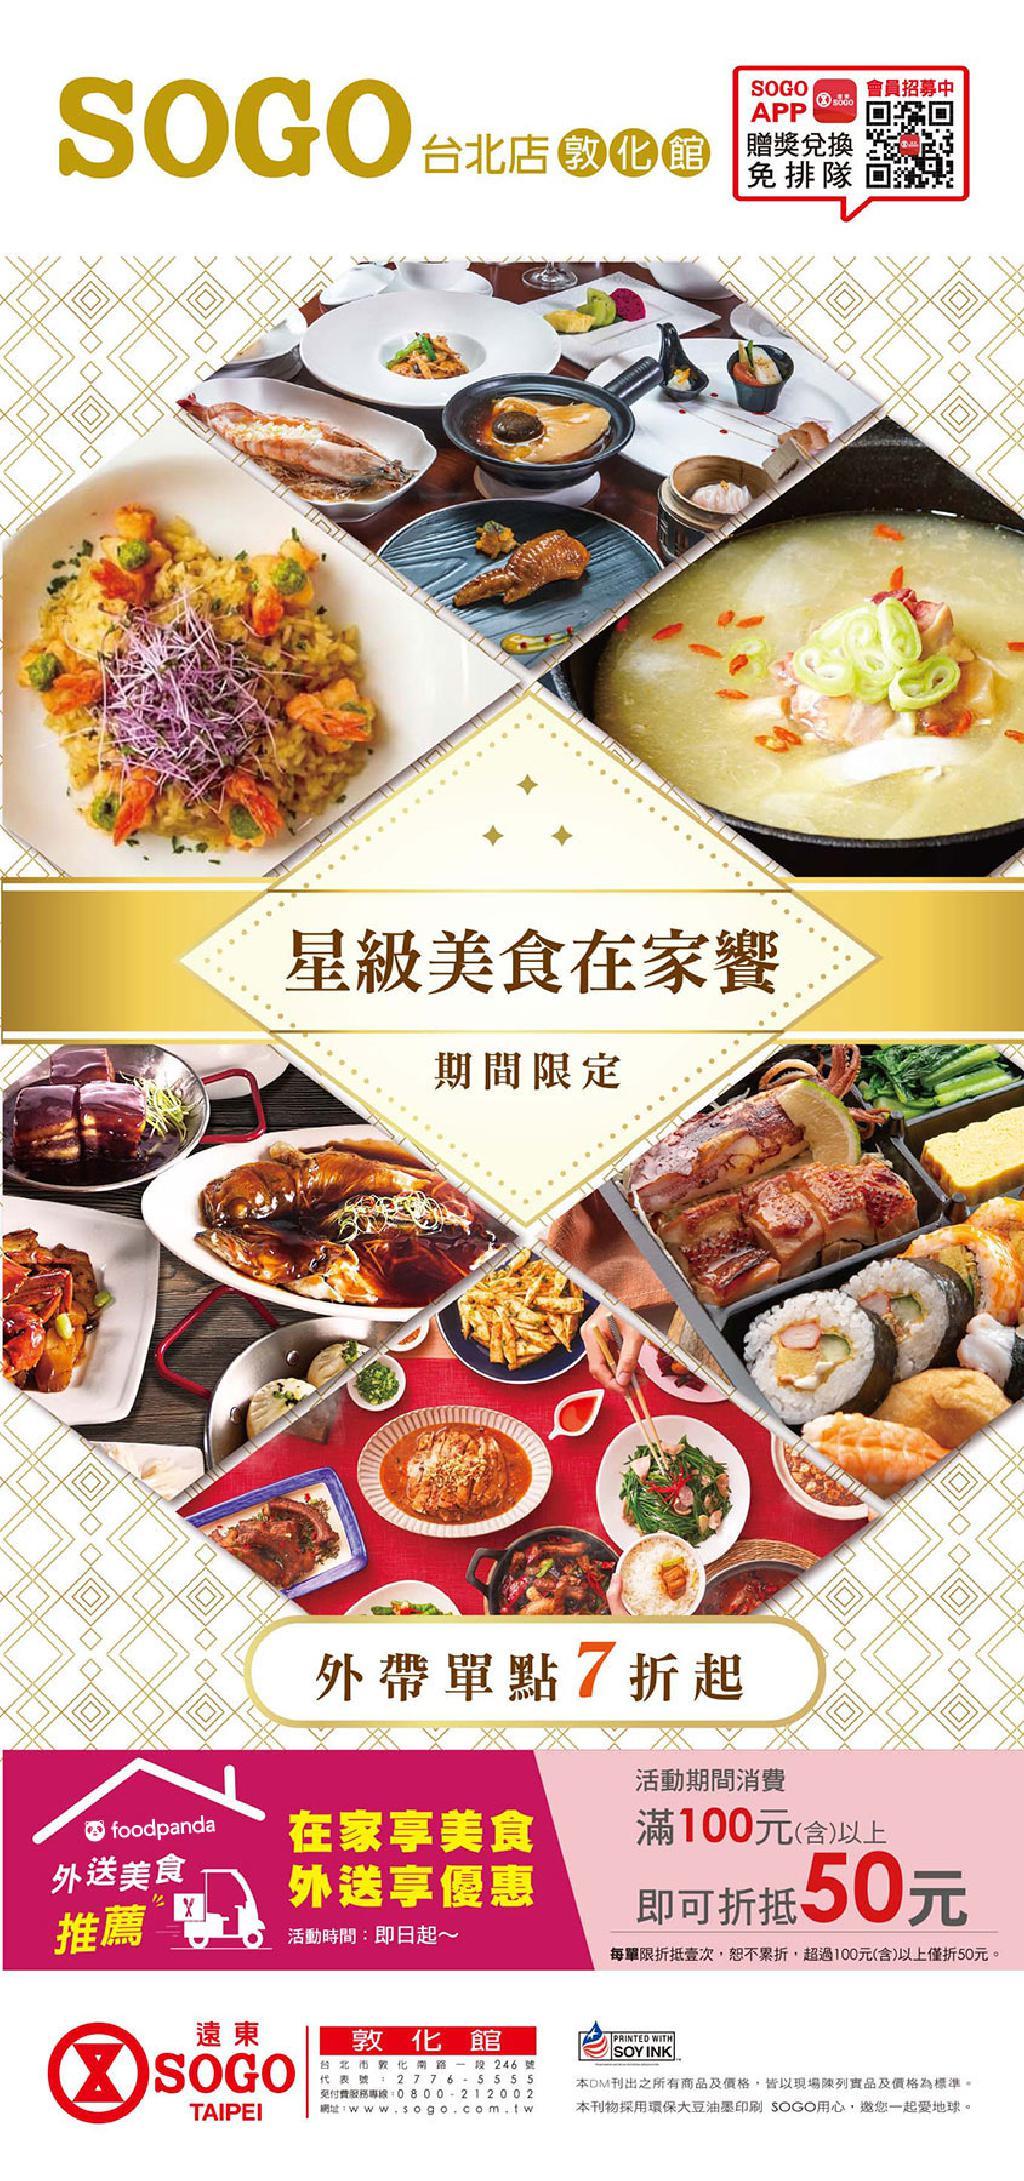 SOGO《台北敦化館》DM 「星級美食在家饗」【2021/7/31 止】